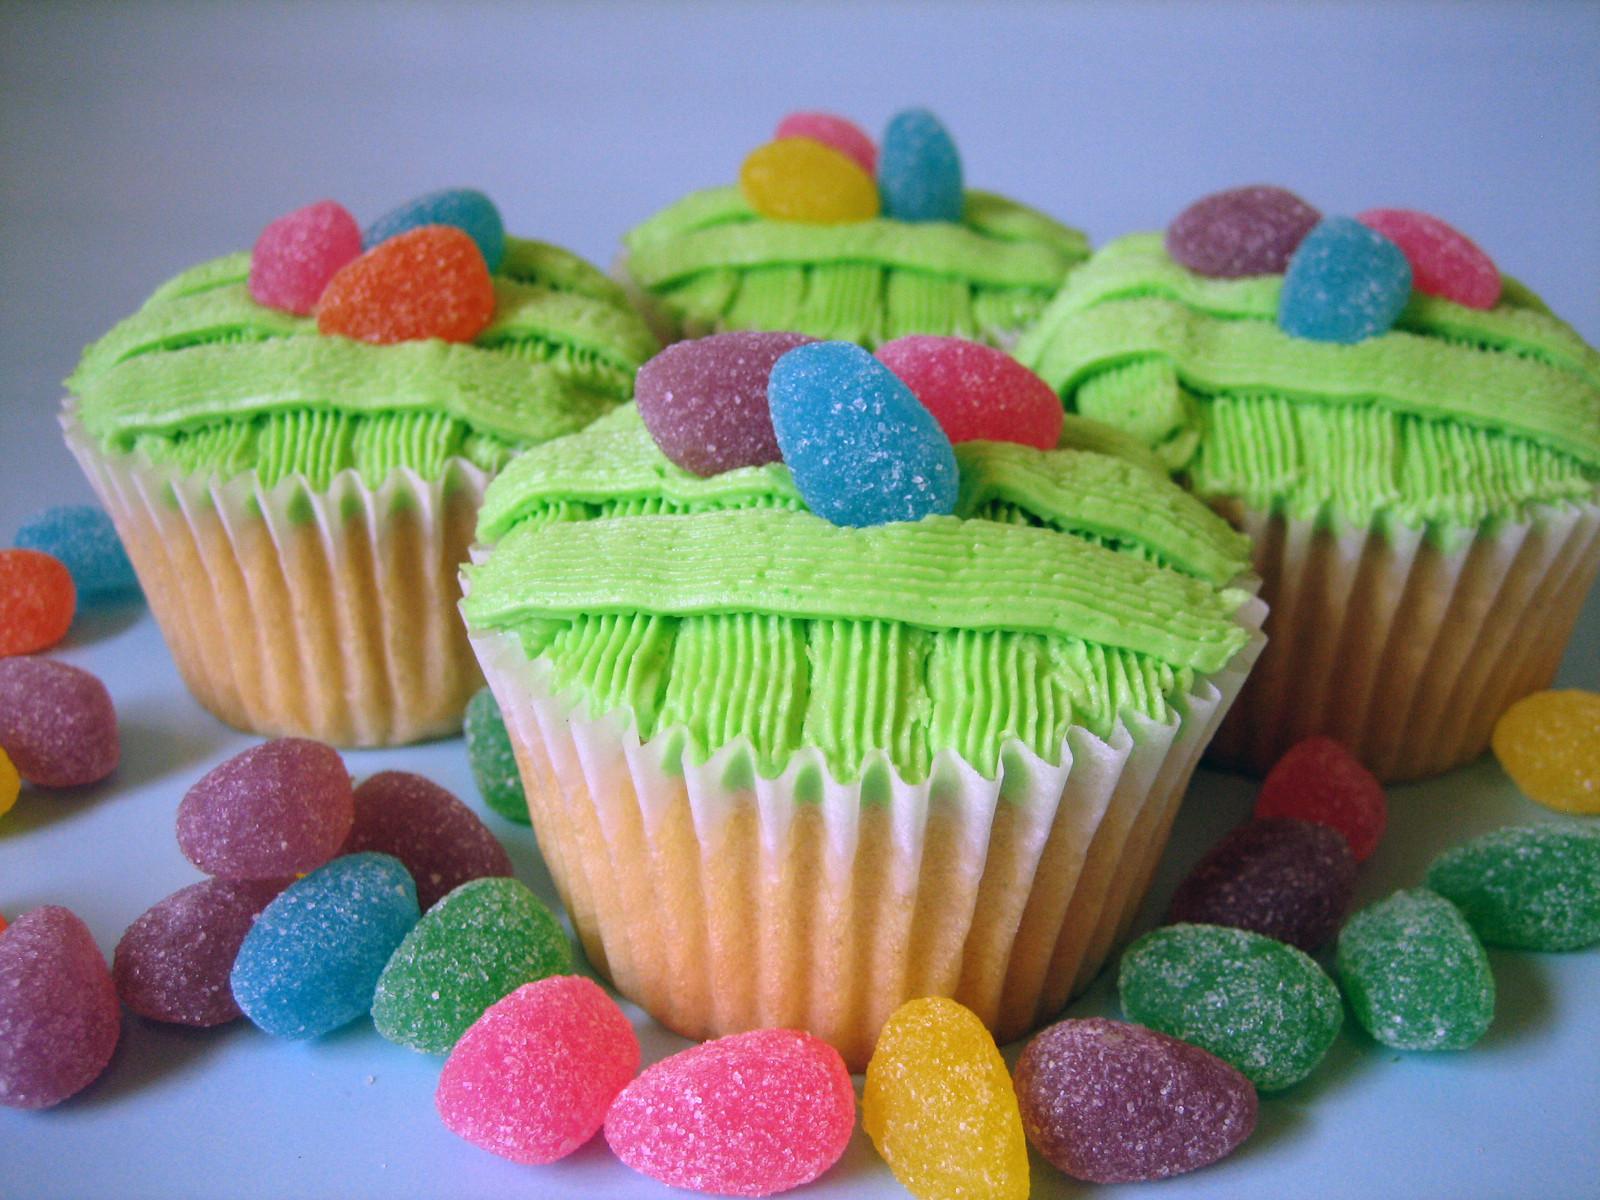 Easter Egg Cupcakes  Sweet Elites Vegan Cupcakes Easter Egg Basket Cupcakes